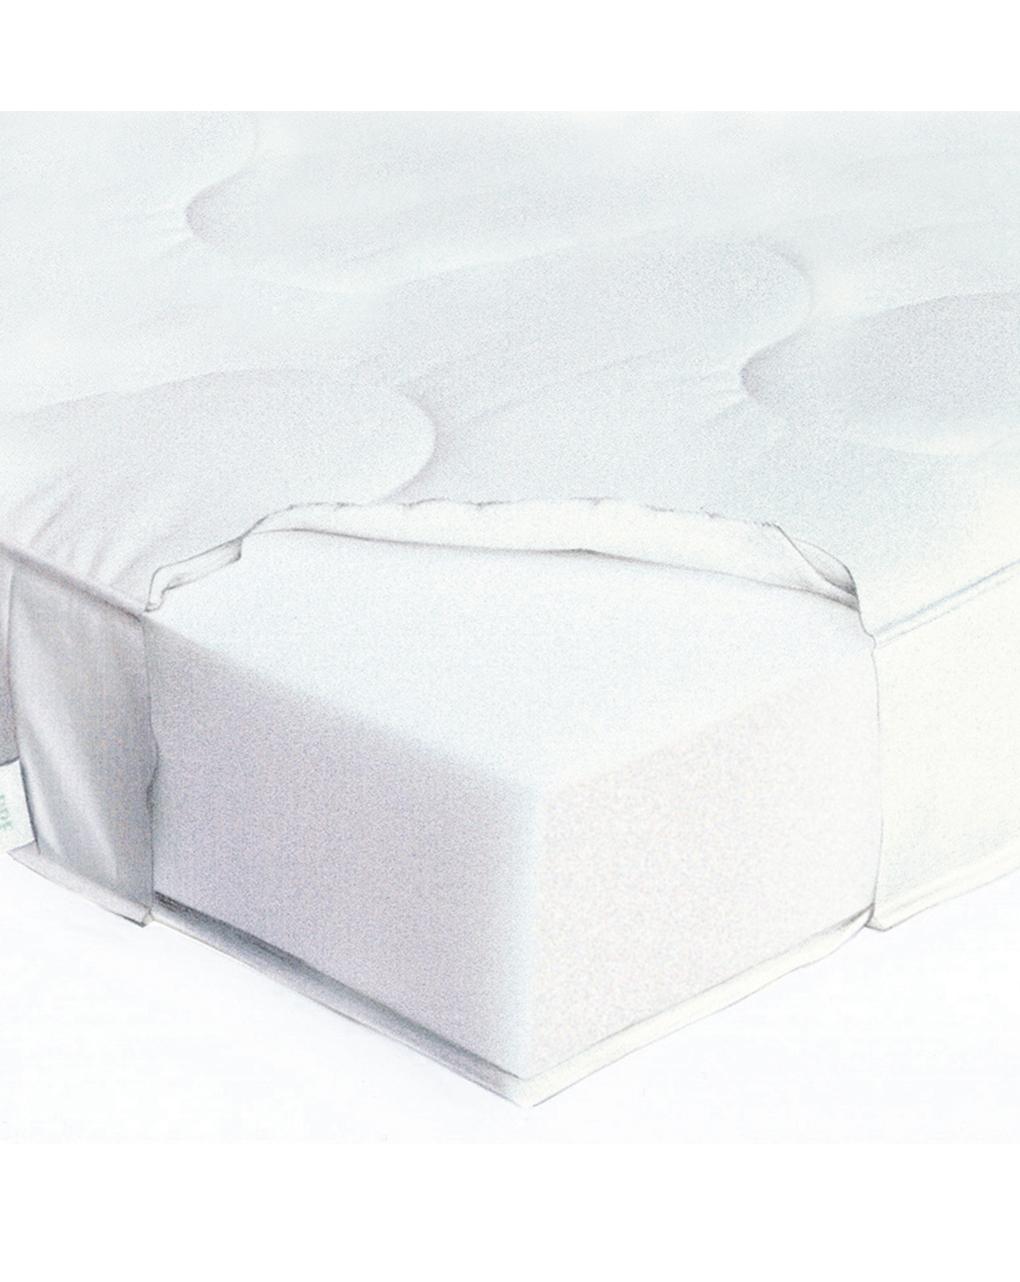 Colchão acolchoado 120x60 cm - Giordani